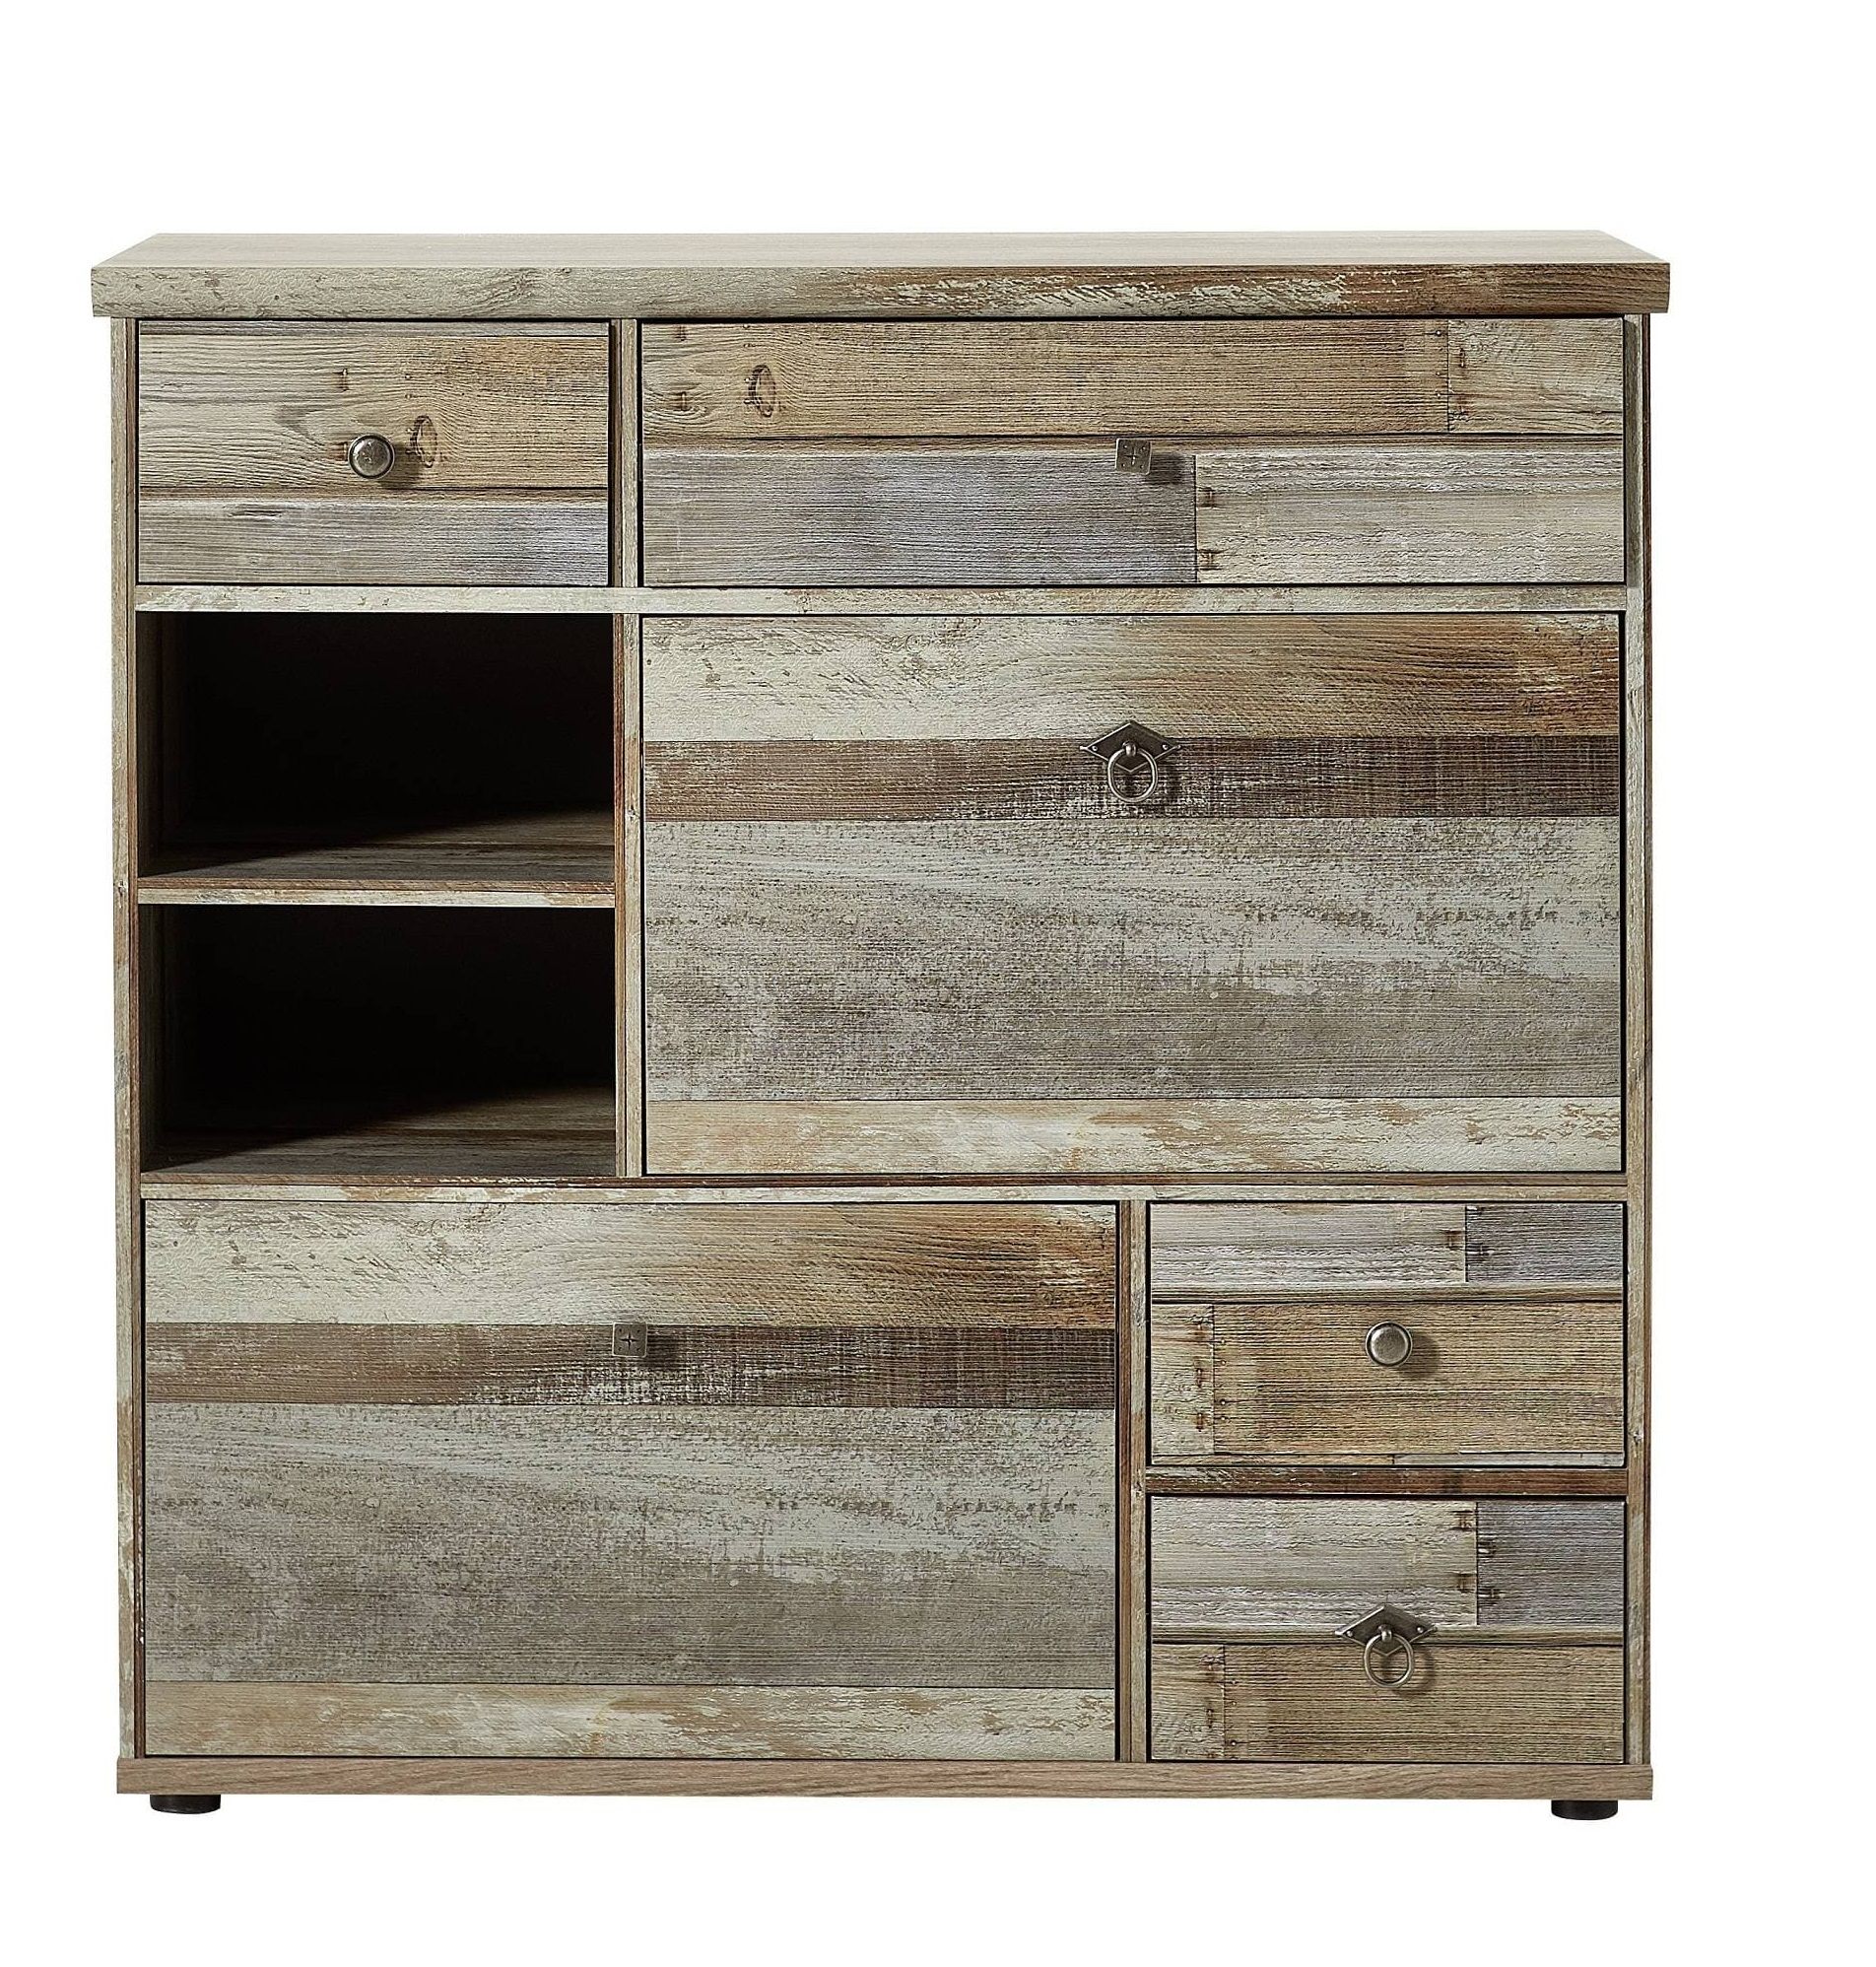 Cabinet hol din pal, cu 2 usi si 4 sertare Bazna Small Natur / Gri inchis, l99xA40xH98 cm somproduct.ro